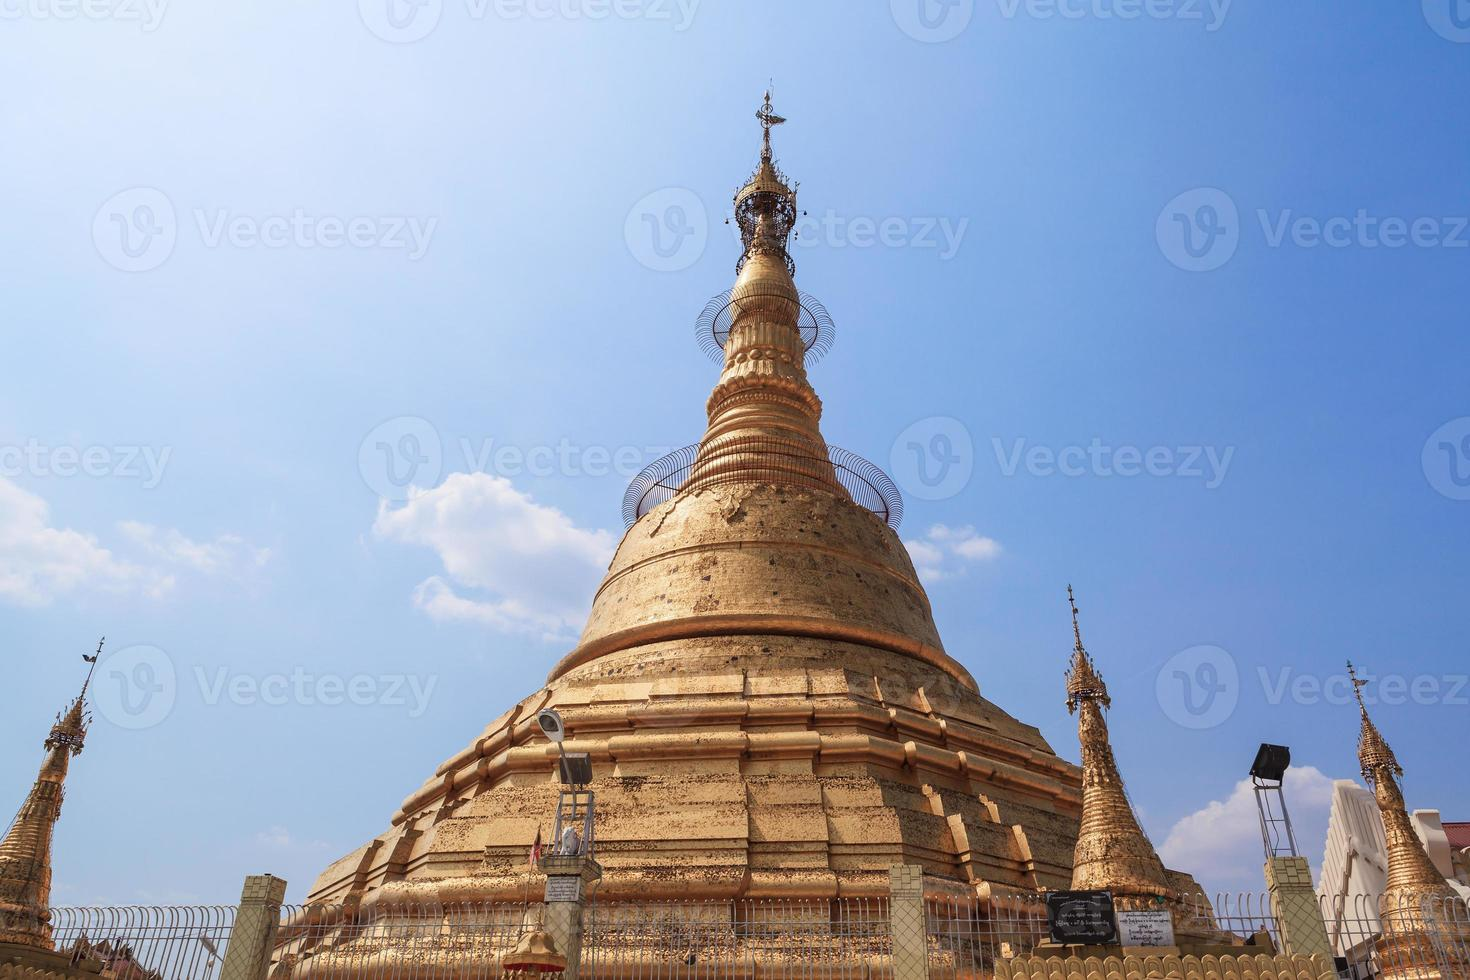 Pagoda Botataung en Yangon, Birmania (Myanmar) foto